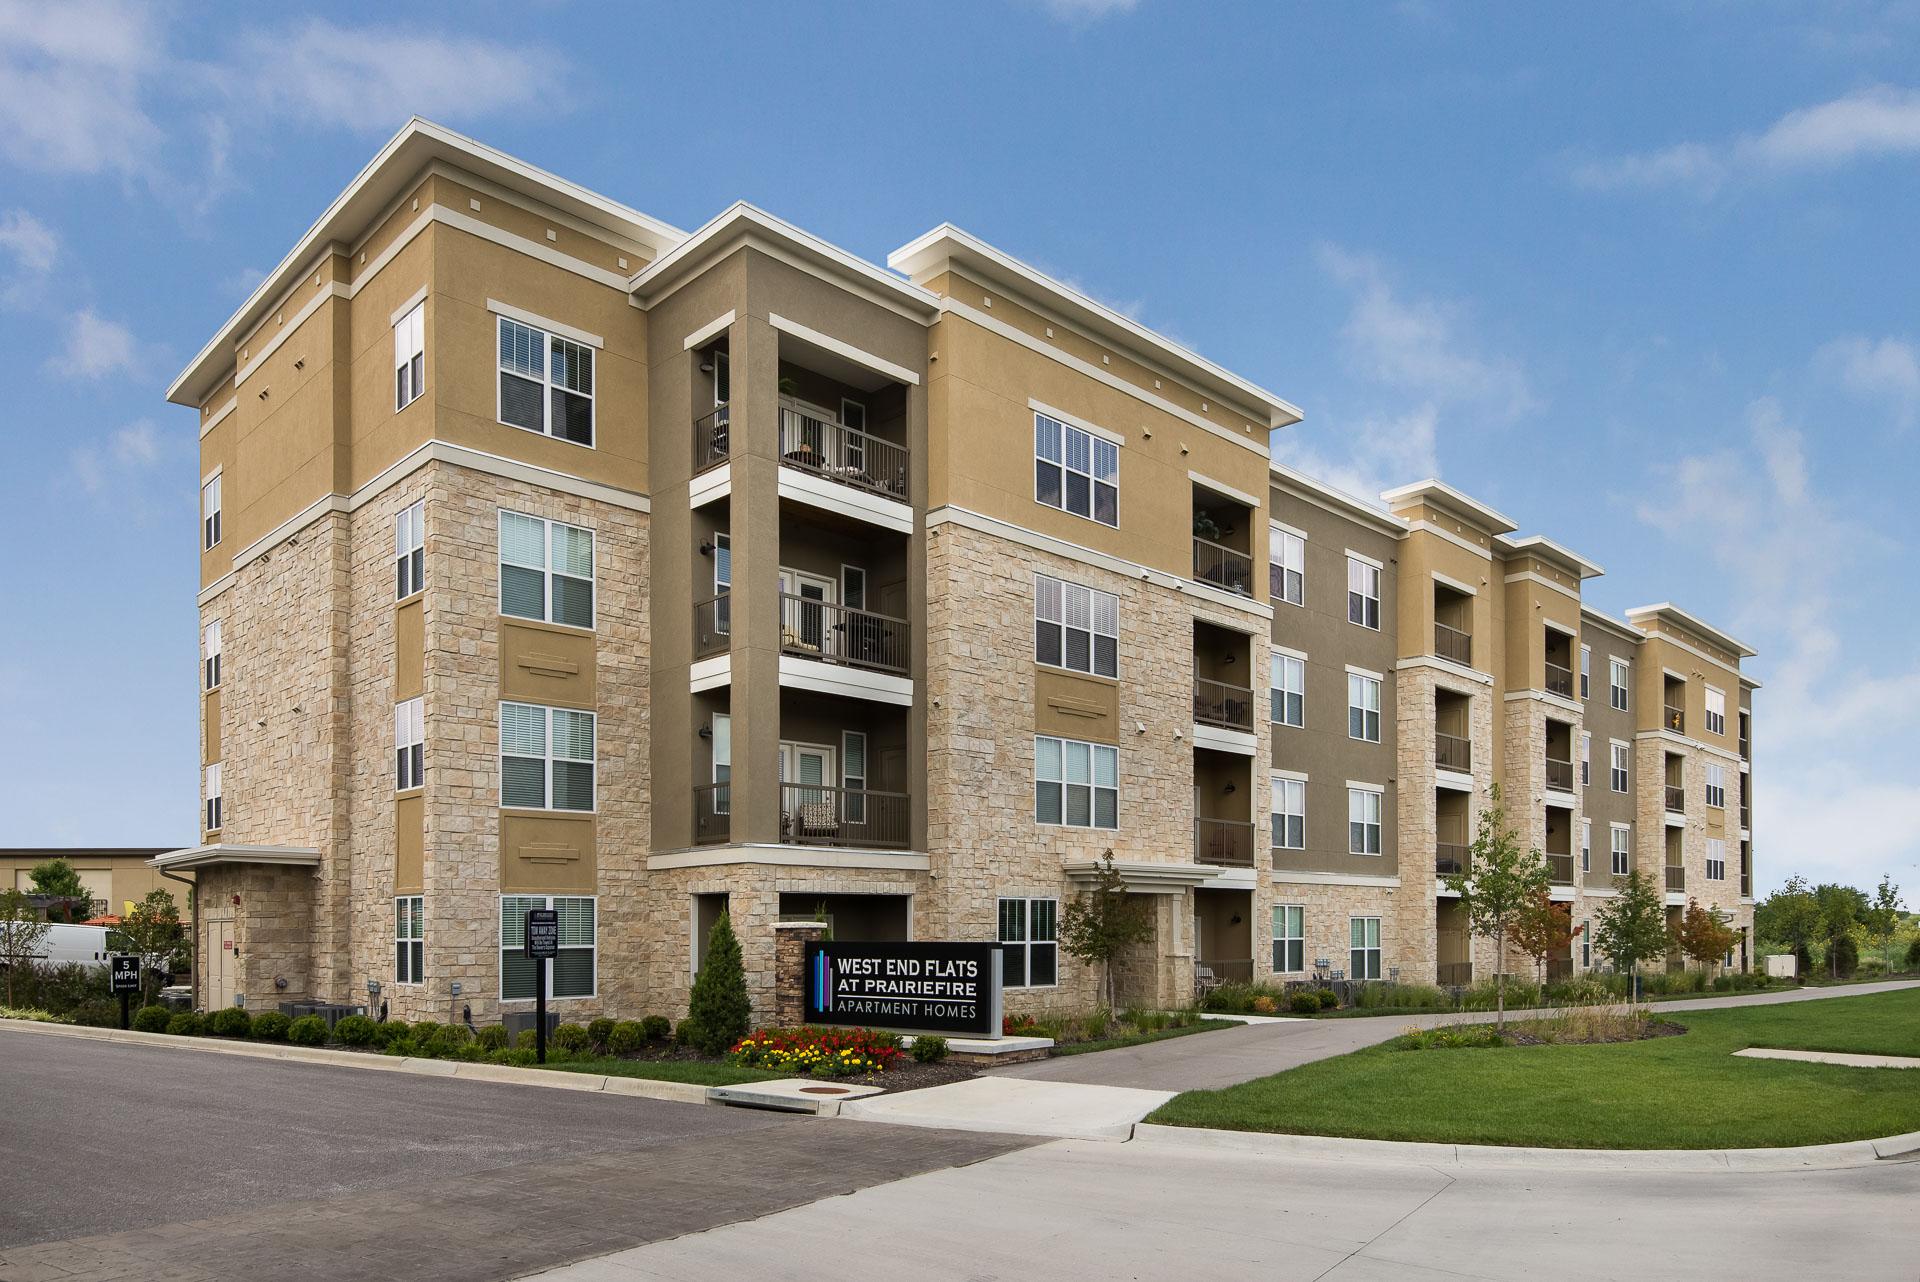 Sherpa Media Kansas City - Apartments & Multi-Family Housing - 15